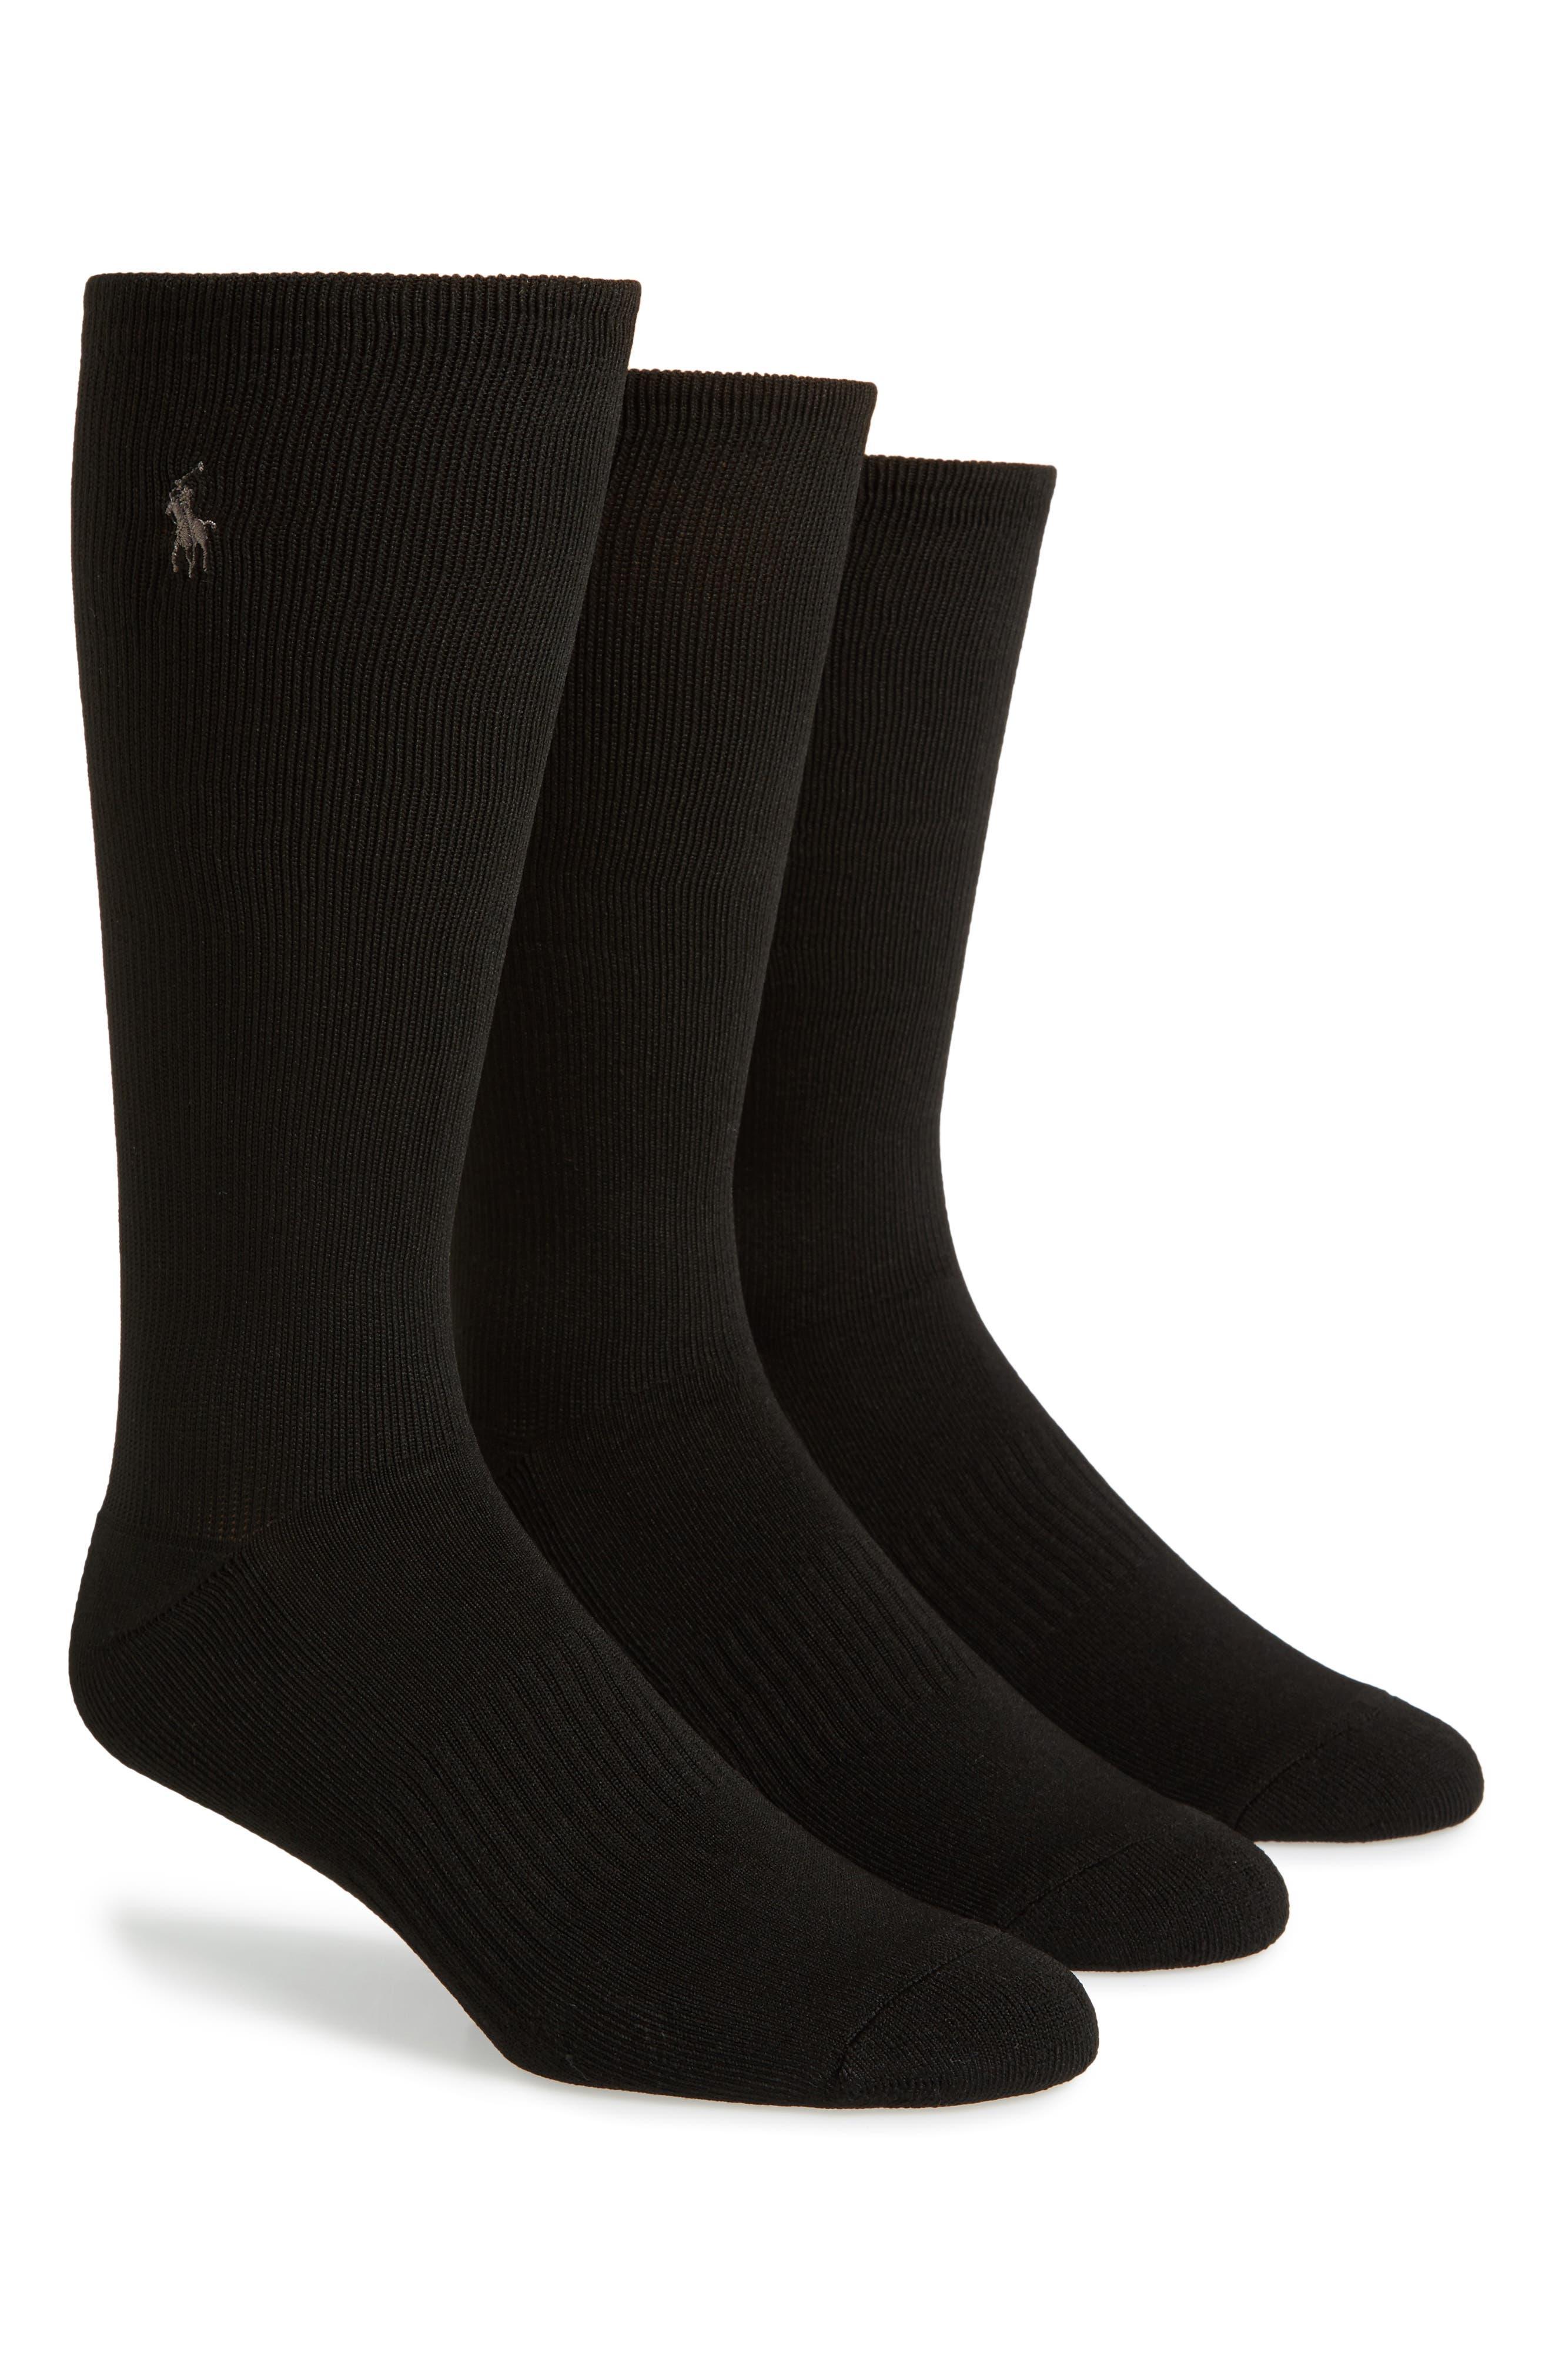 Main Image - Polo Ralph Lauren 3-Pack Compression Socks